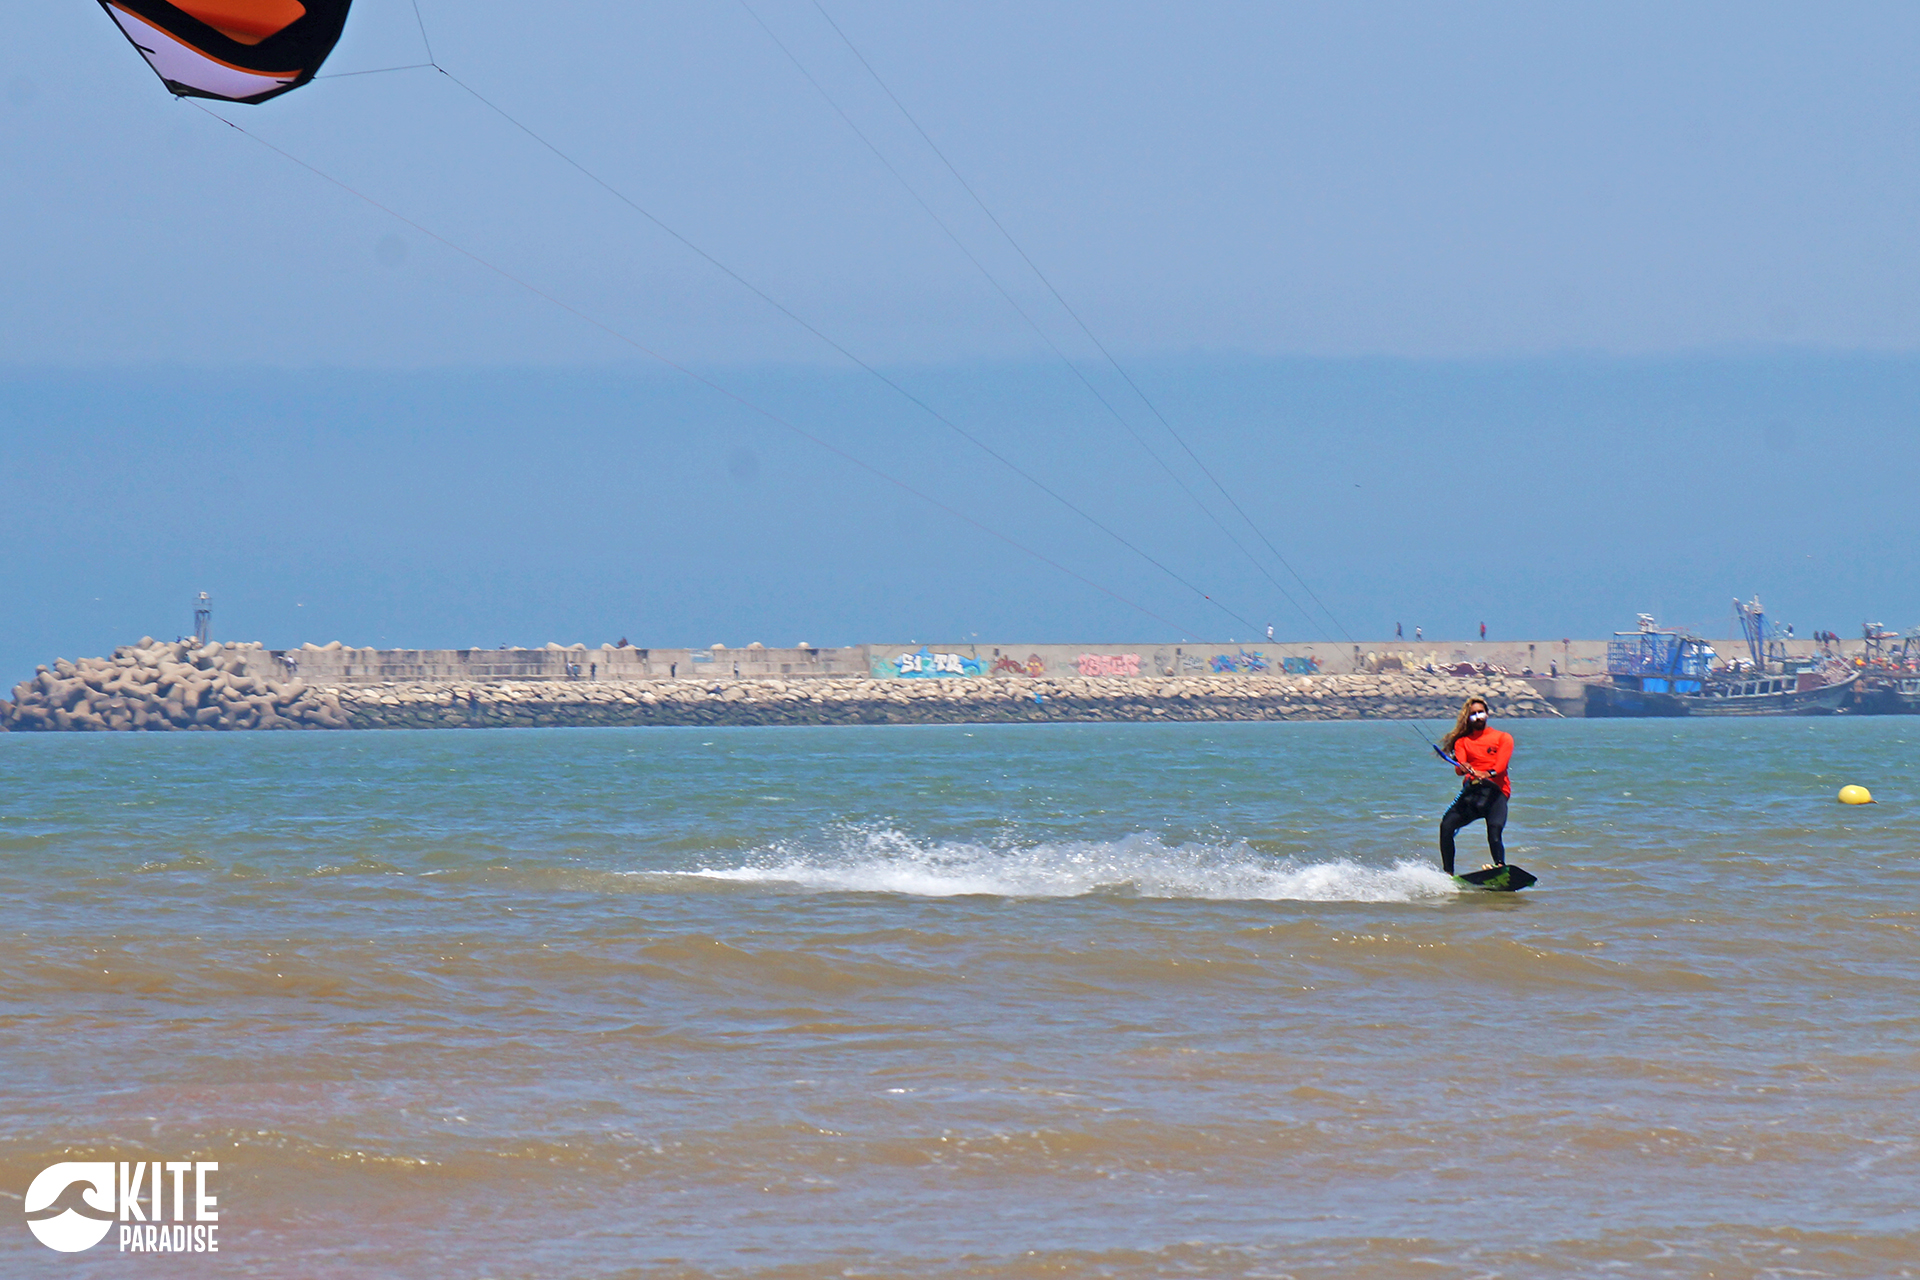 Essaouira Baie Kitesurf